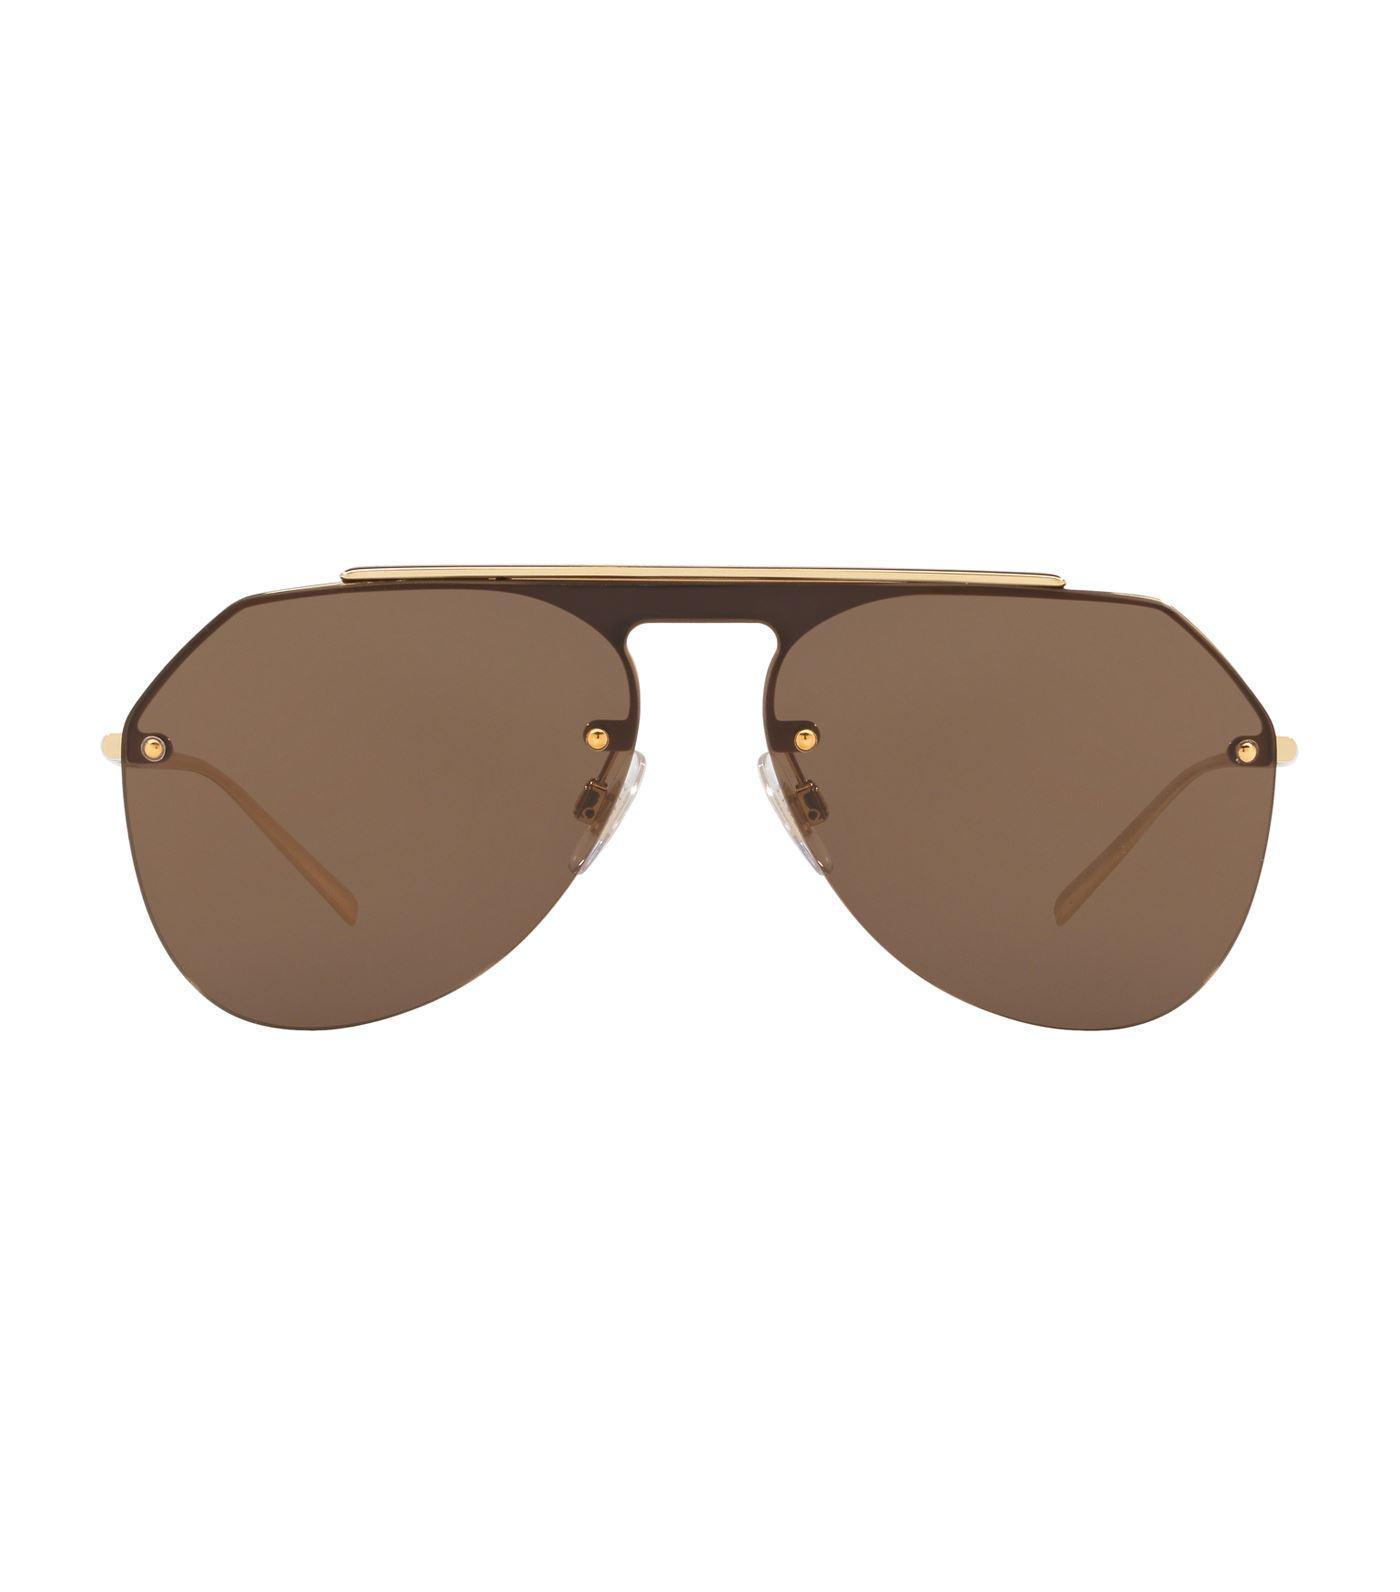 7827293511d5 Lyst - Dolce   Gabbana Pilot Sunglasses in Metallic for Men